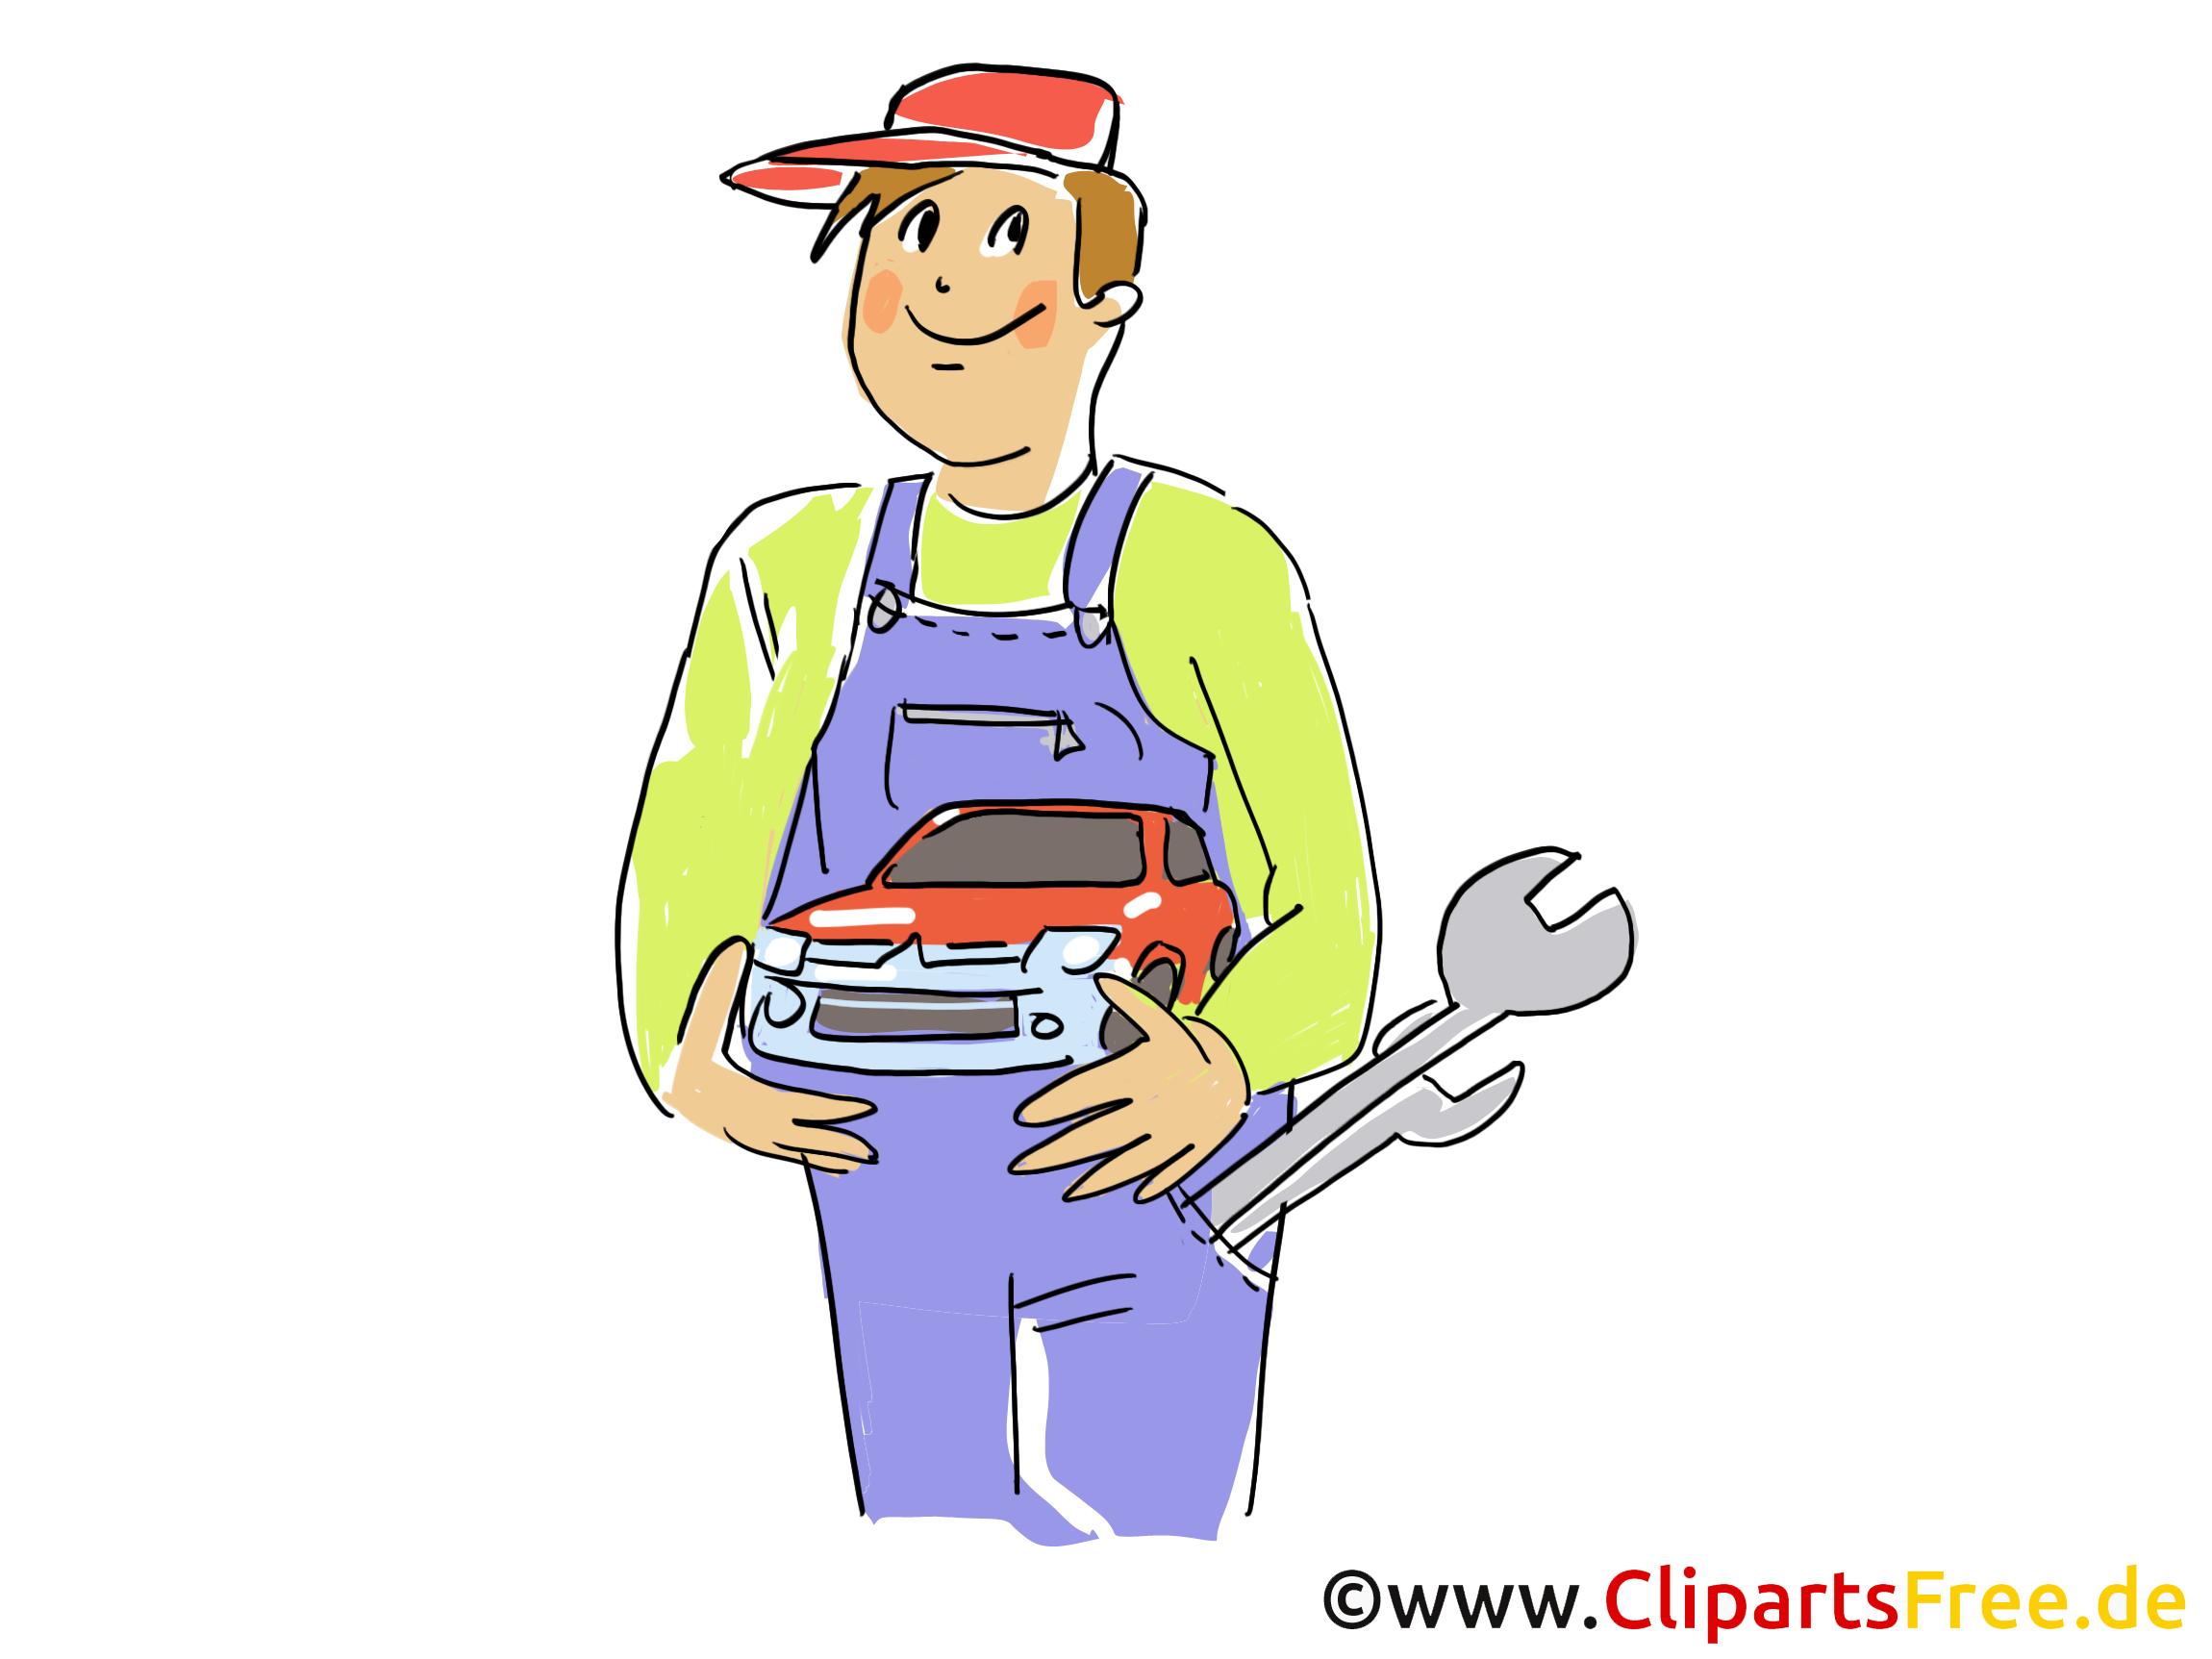 Kfz Mechaniker In Werkstatt Clipart Bild Grafik Cartoon